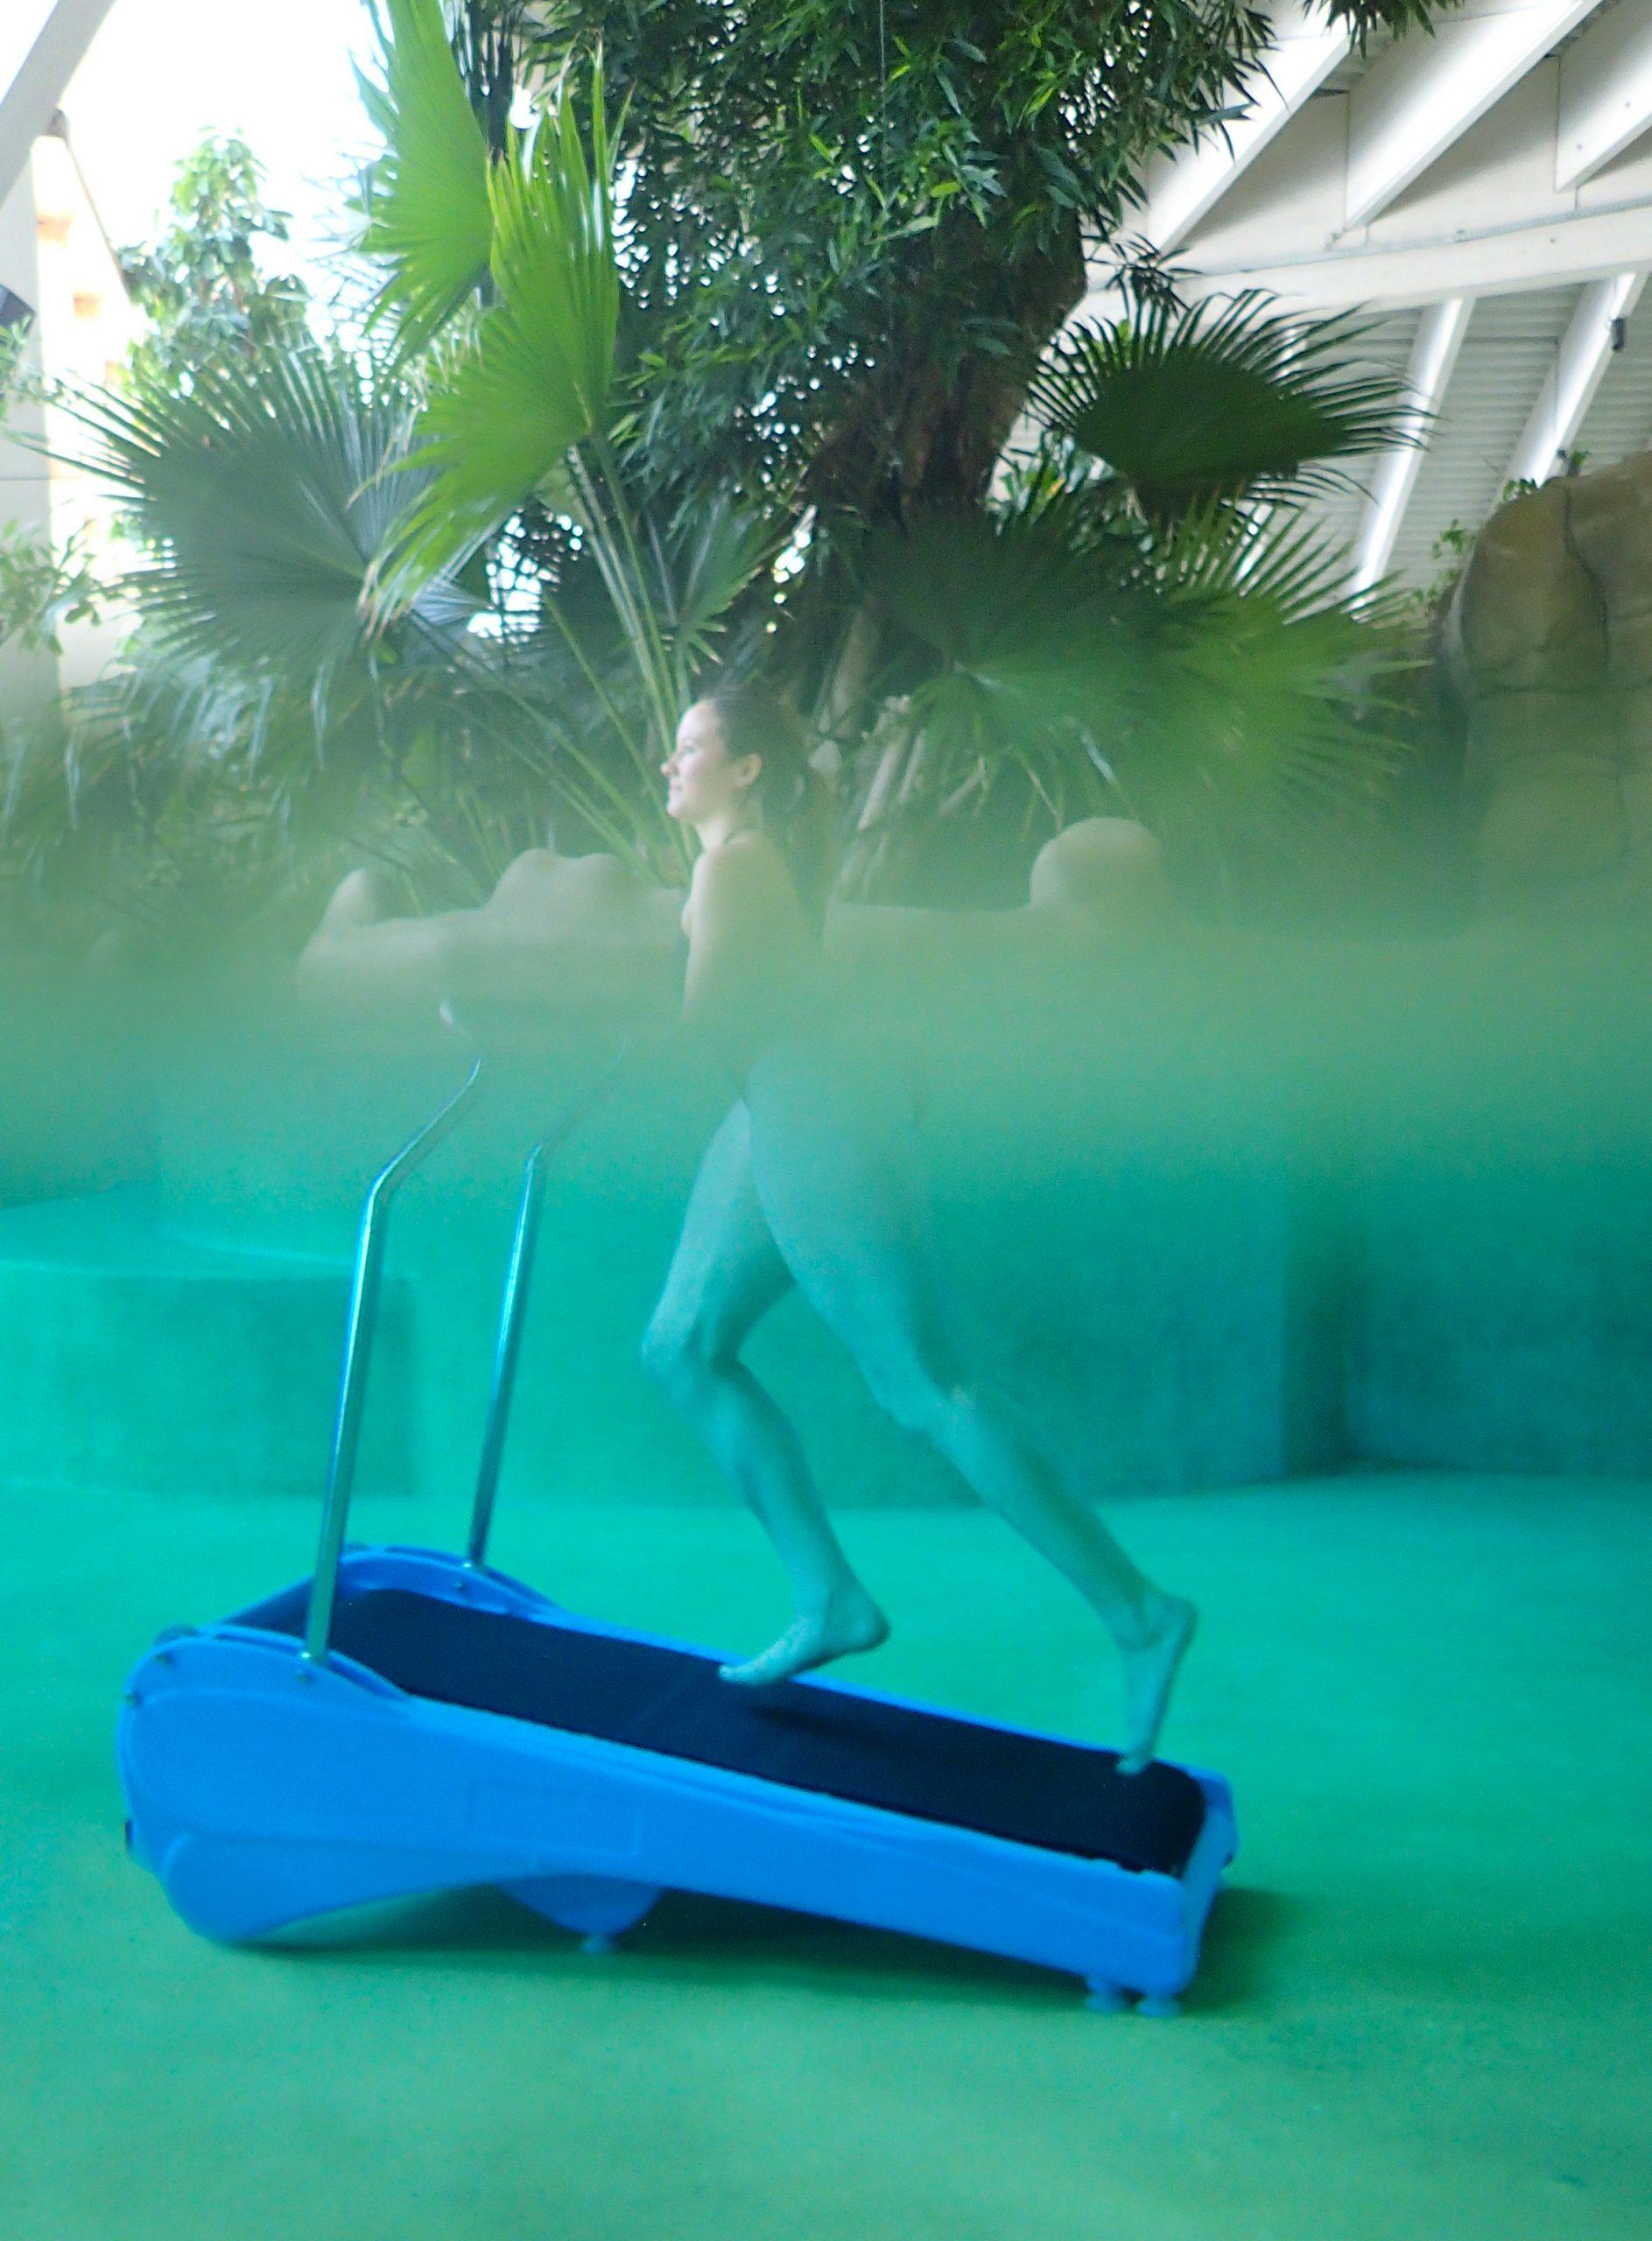 Aquariaz : Parc Aquatique Portes Du Soleil, Station De Ski ... encequiconcerne Avoriaz Piscine